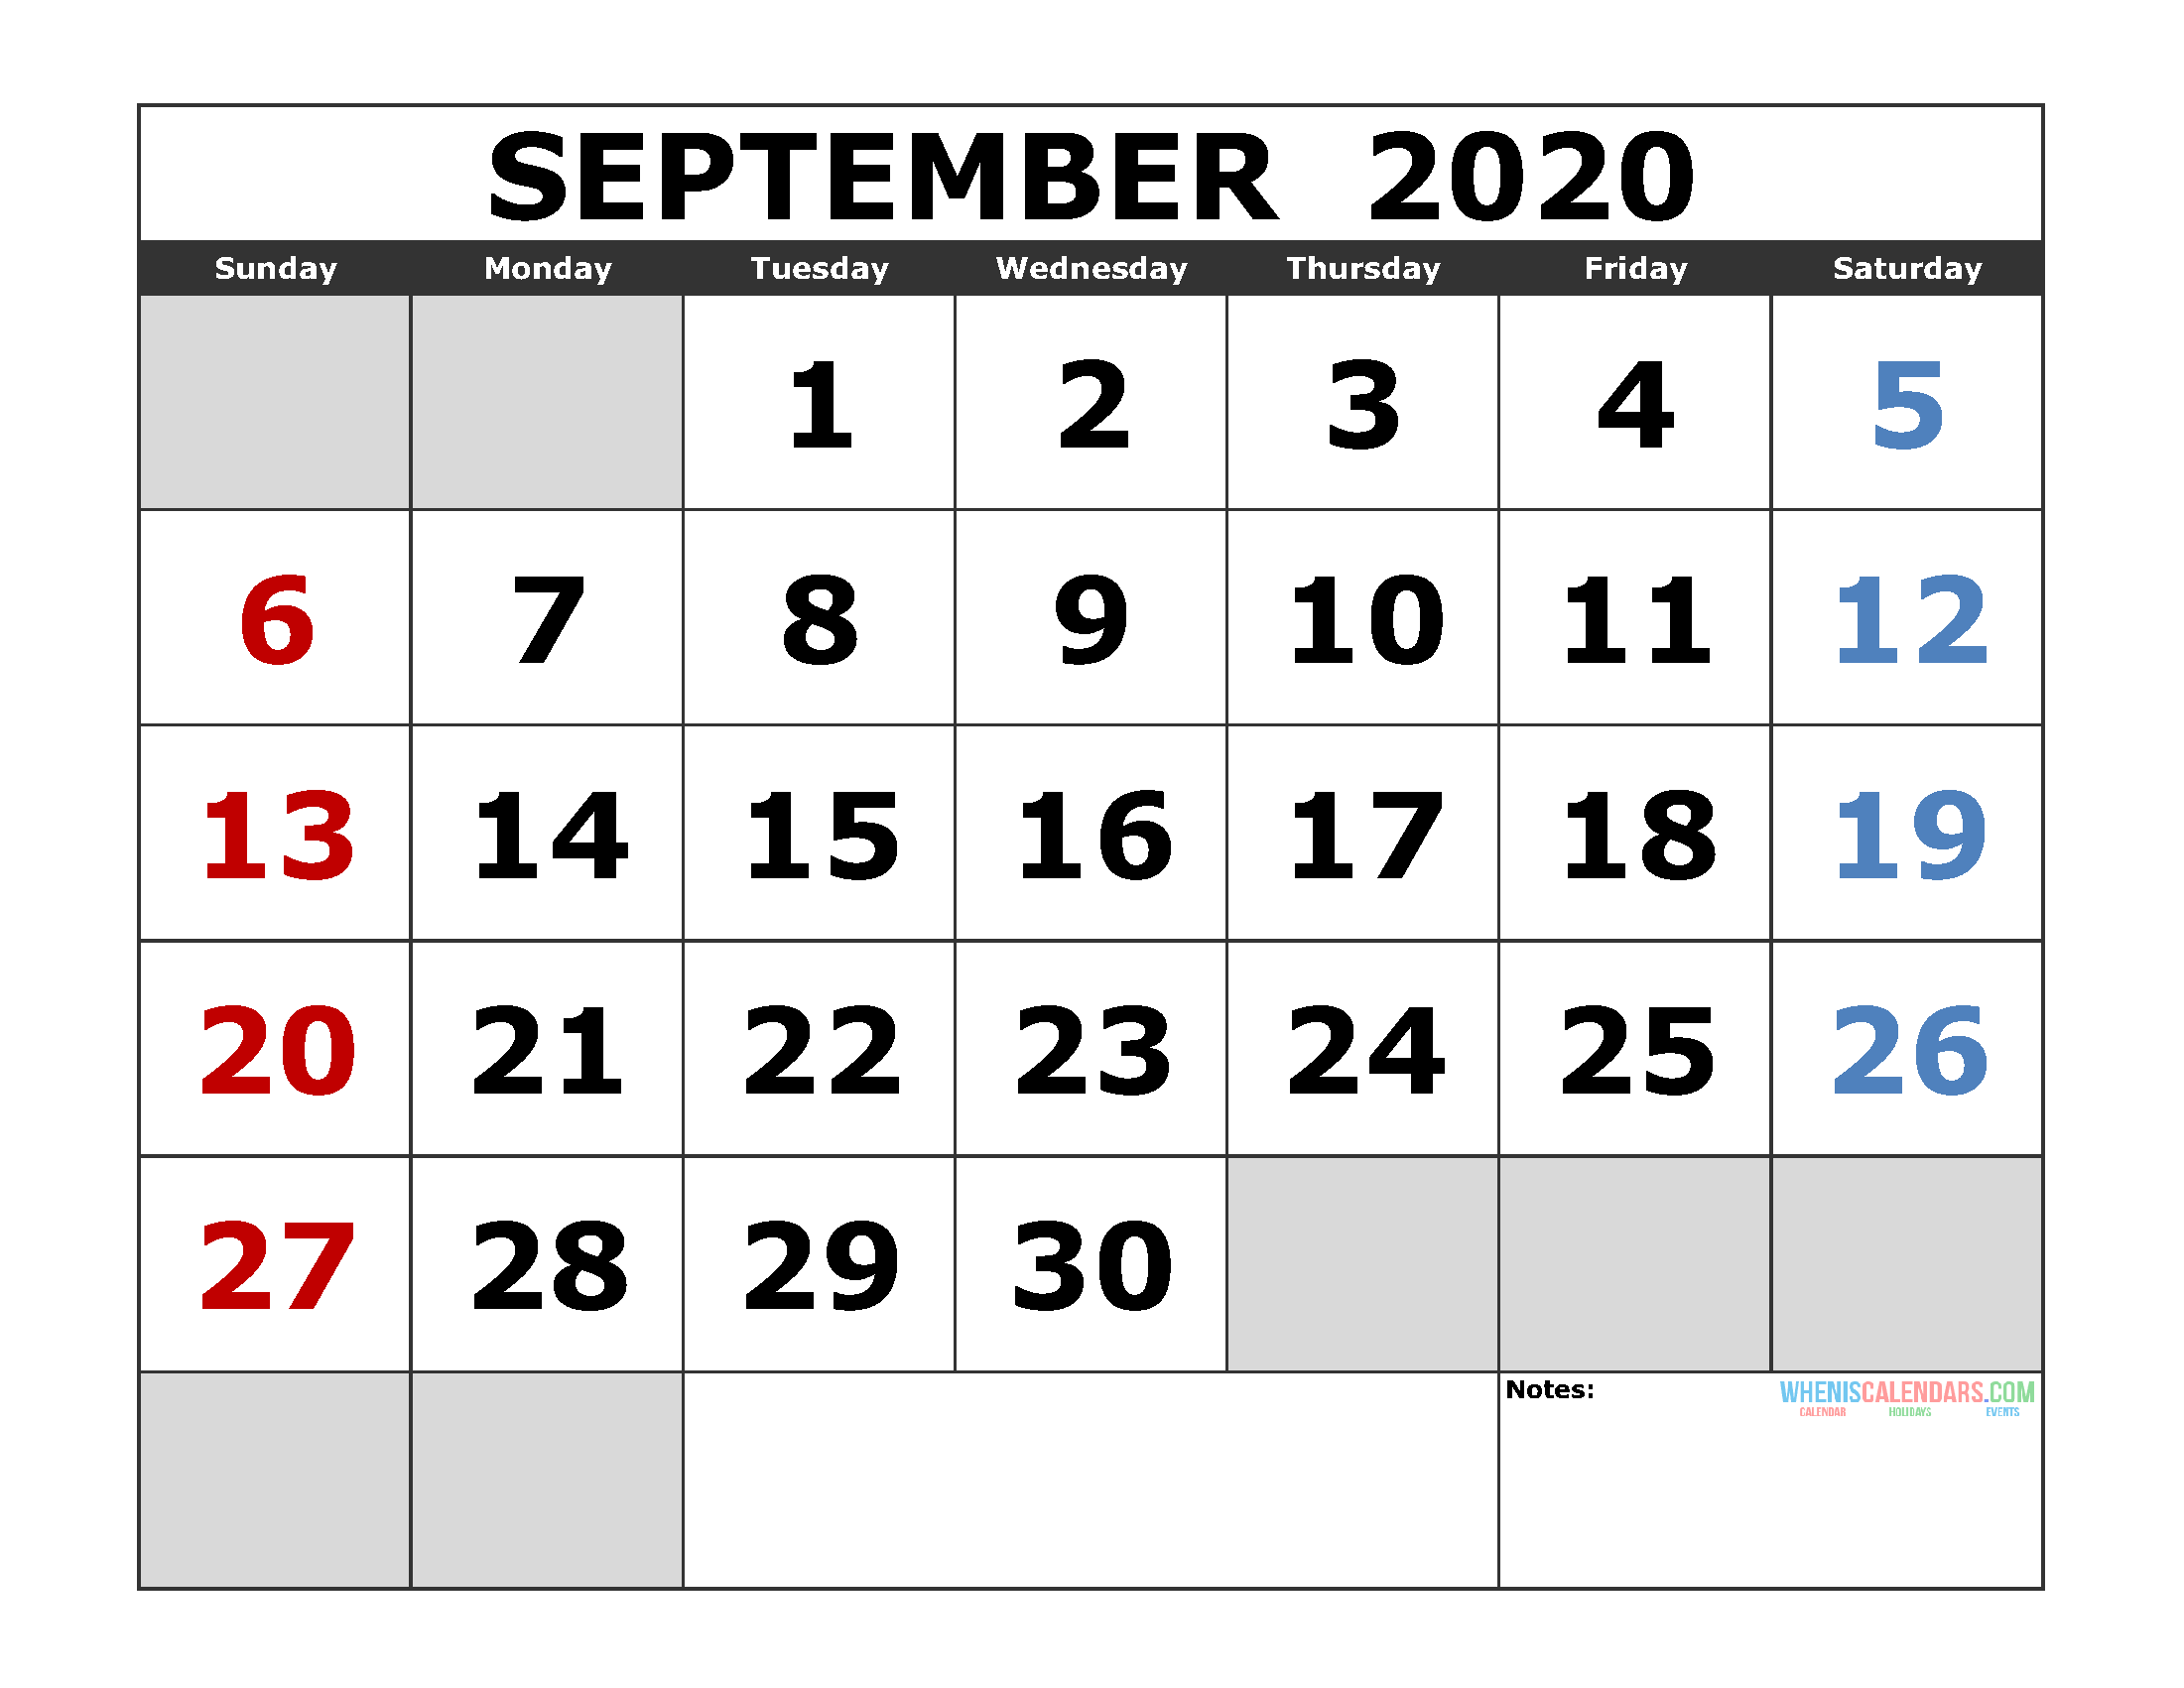 September 2020 Printable Calendar Pdf September 2020 Printable Calendar Template Excel, PDF, Image [US